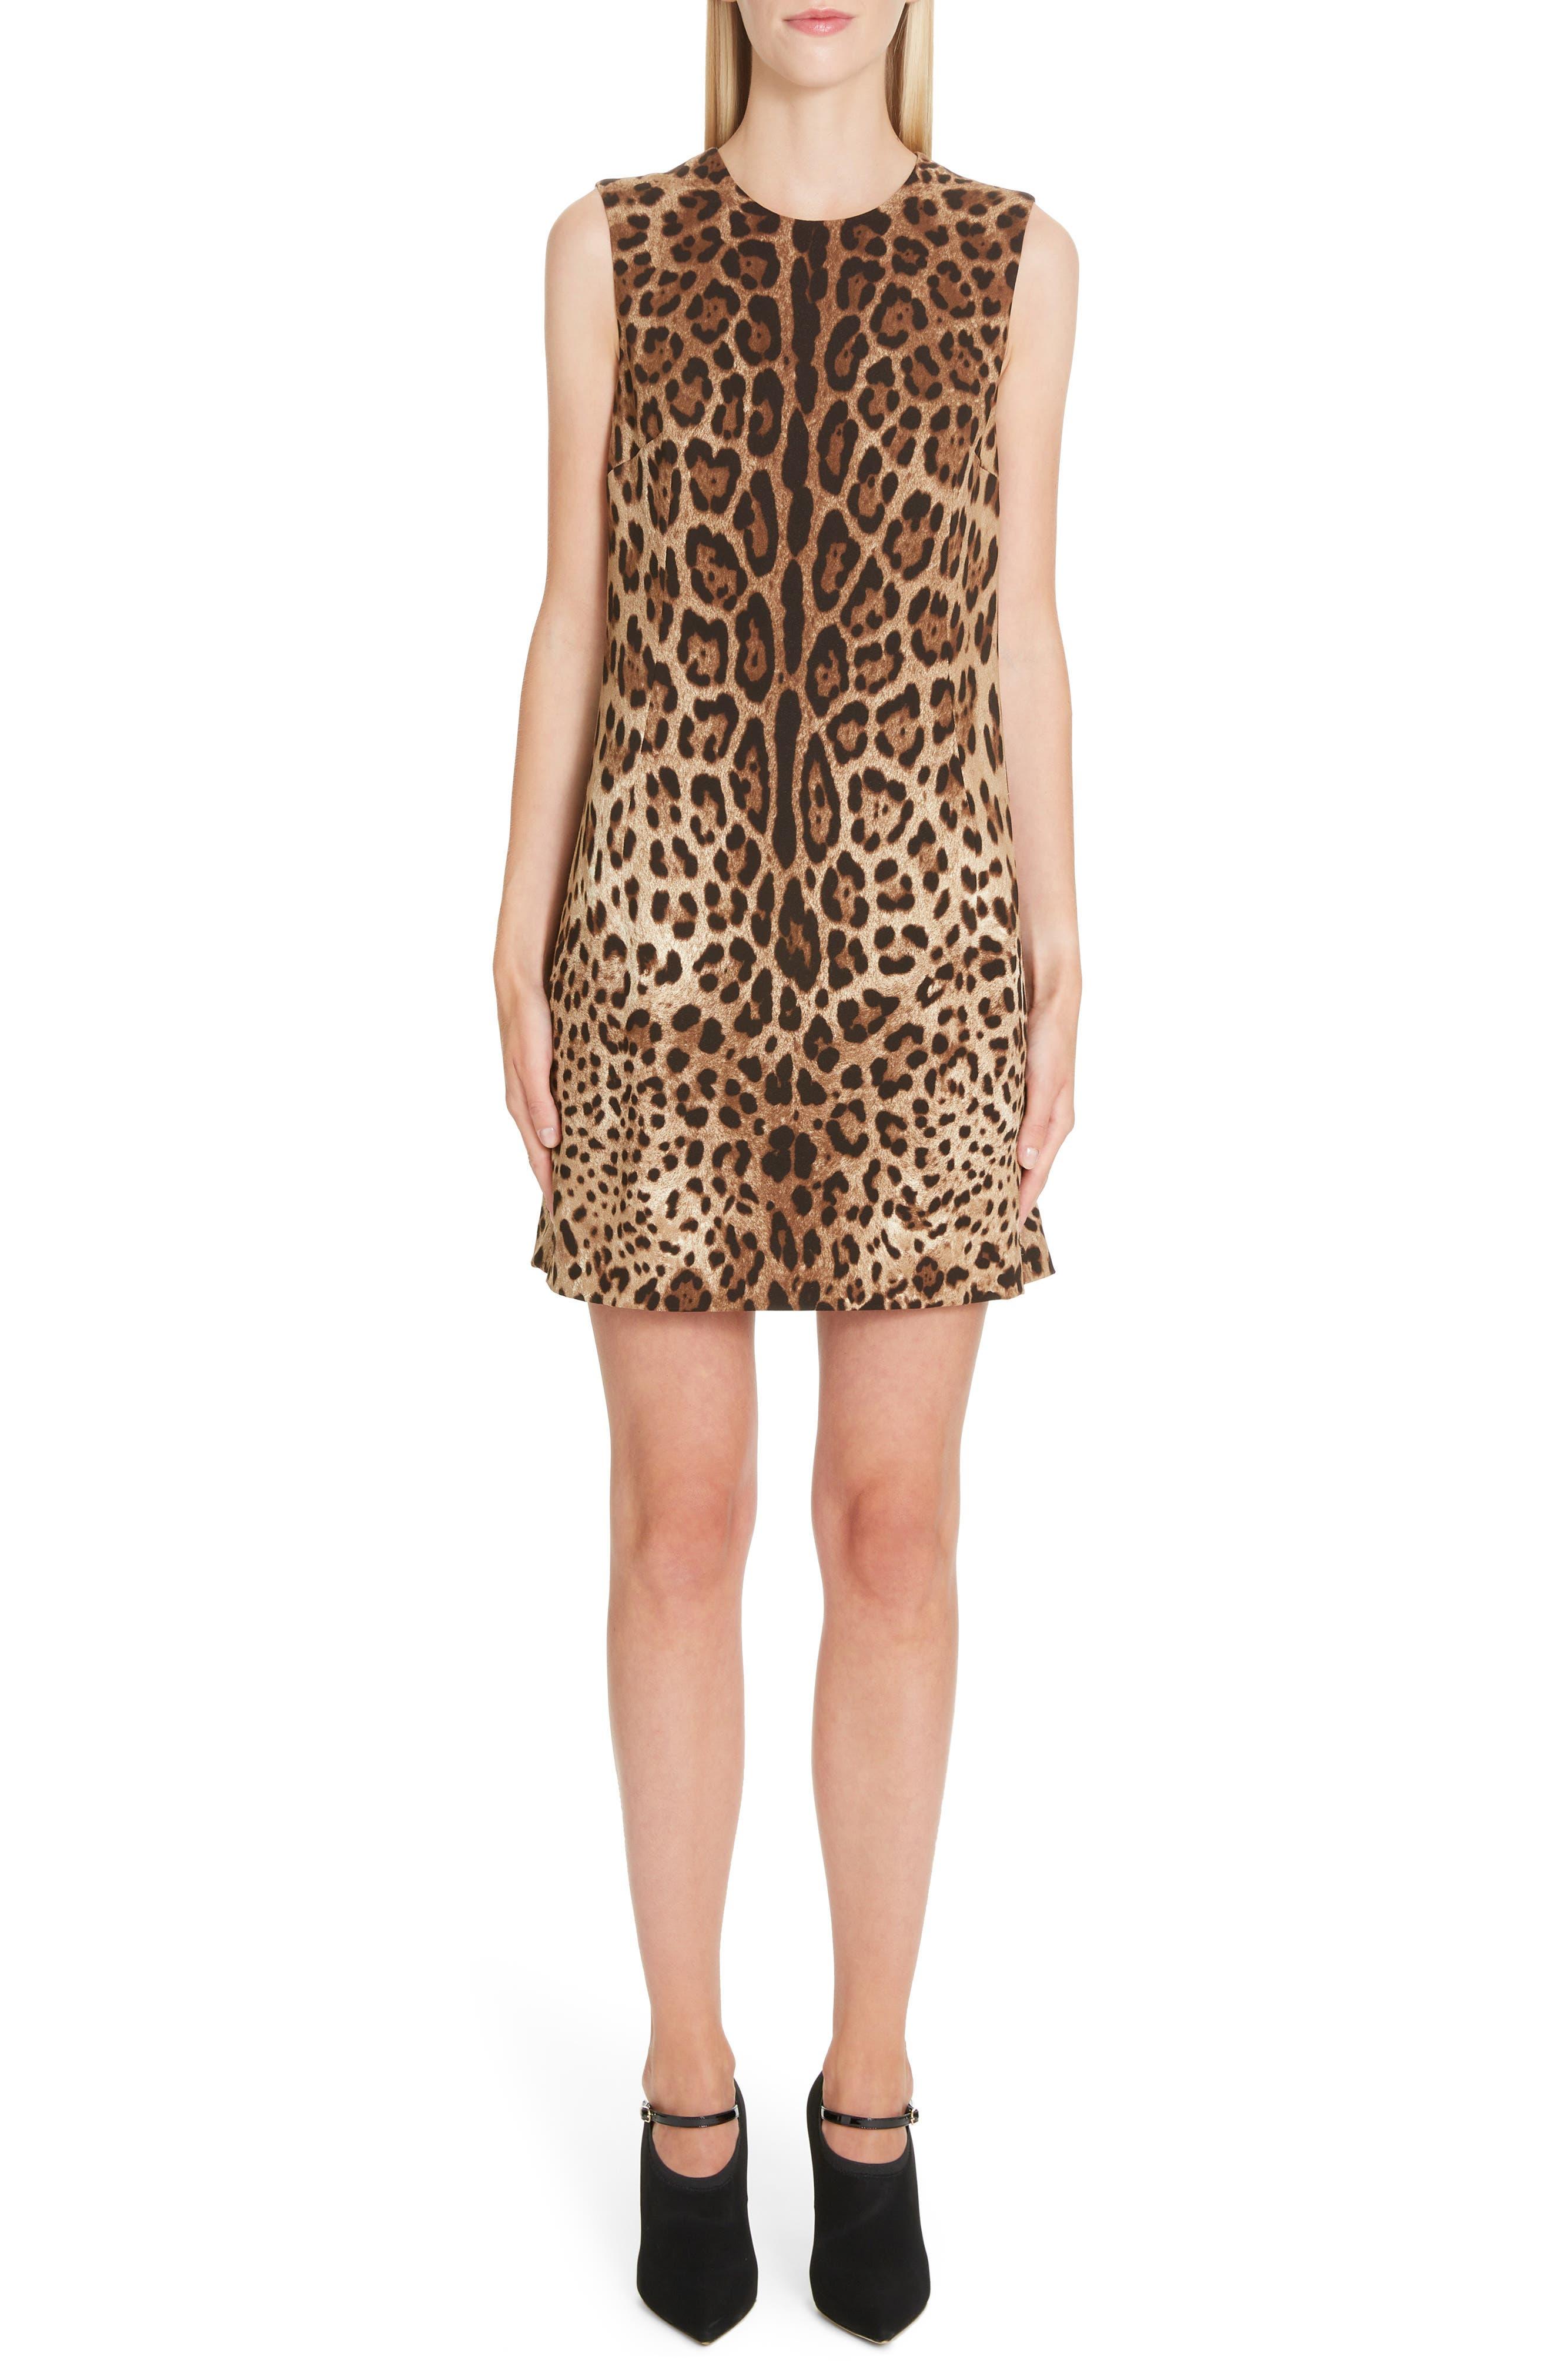 Dolce & gabbana Leopard Print Shift Dress, 8 IT - Brown